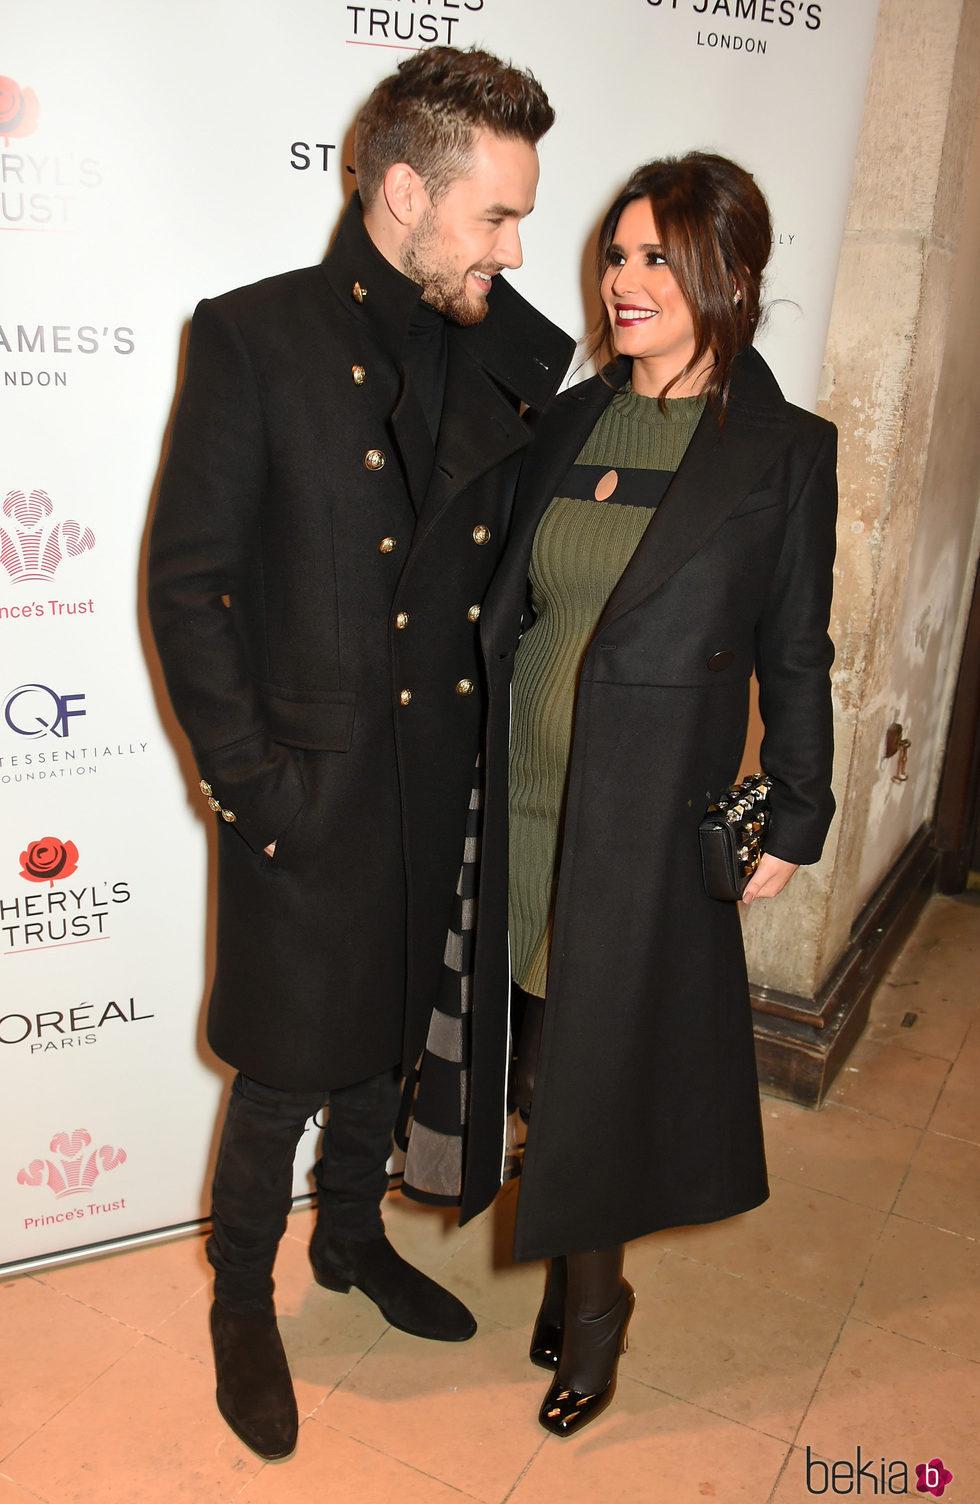 Cheryl y Liam Payne en el photocall de 'The Fayre of St James's'